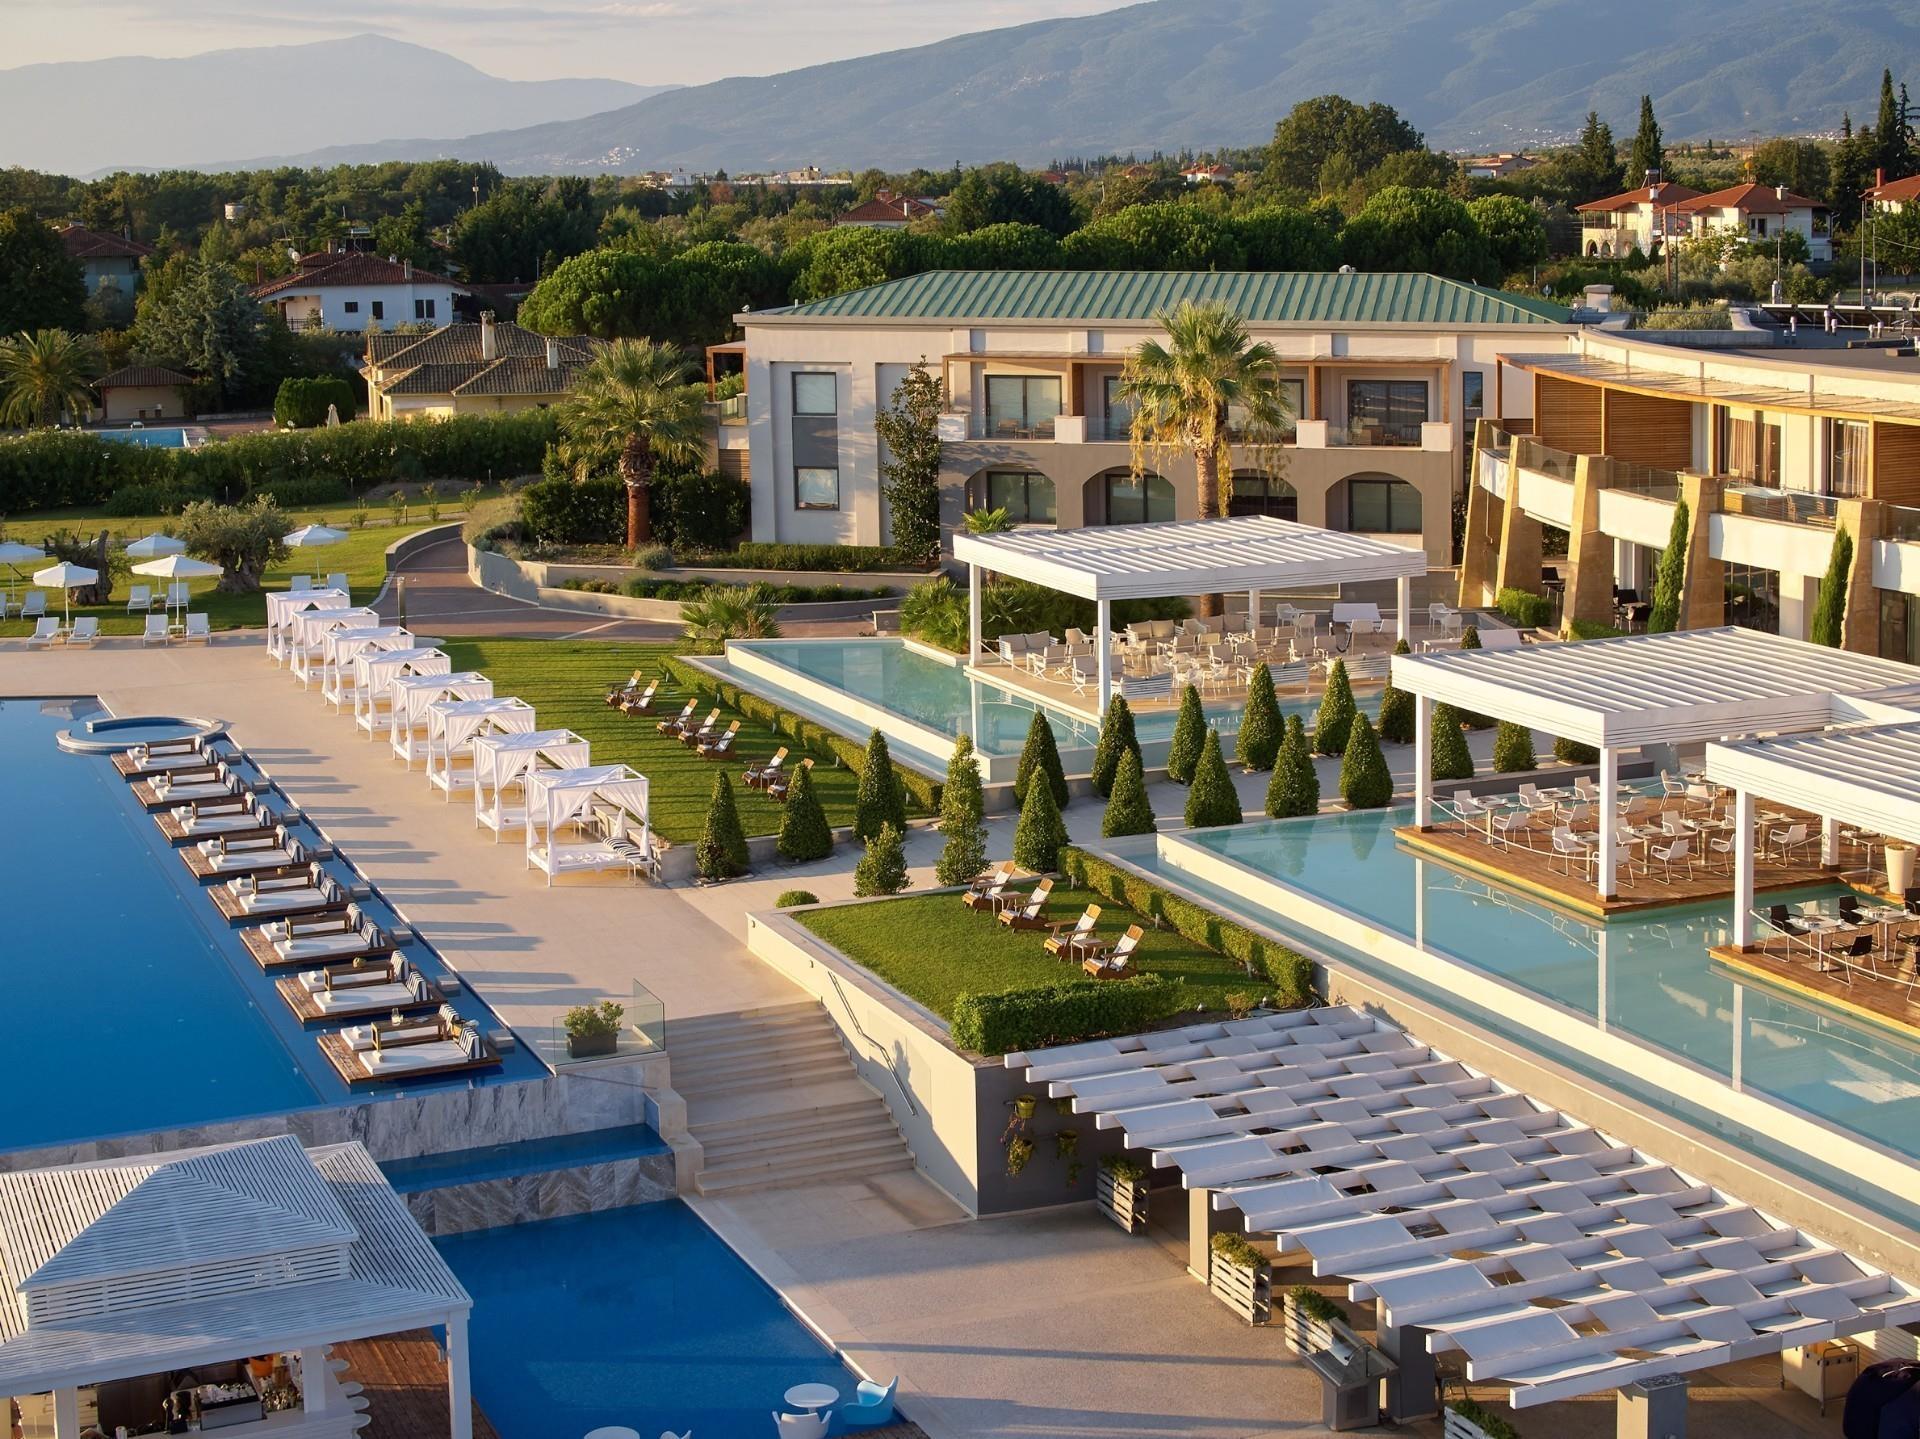 cavo-olympo-luxury-hotel-spa-genel-009